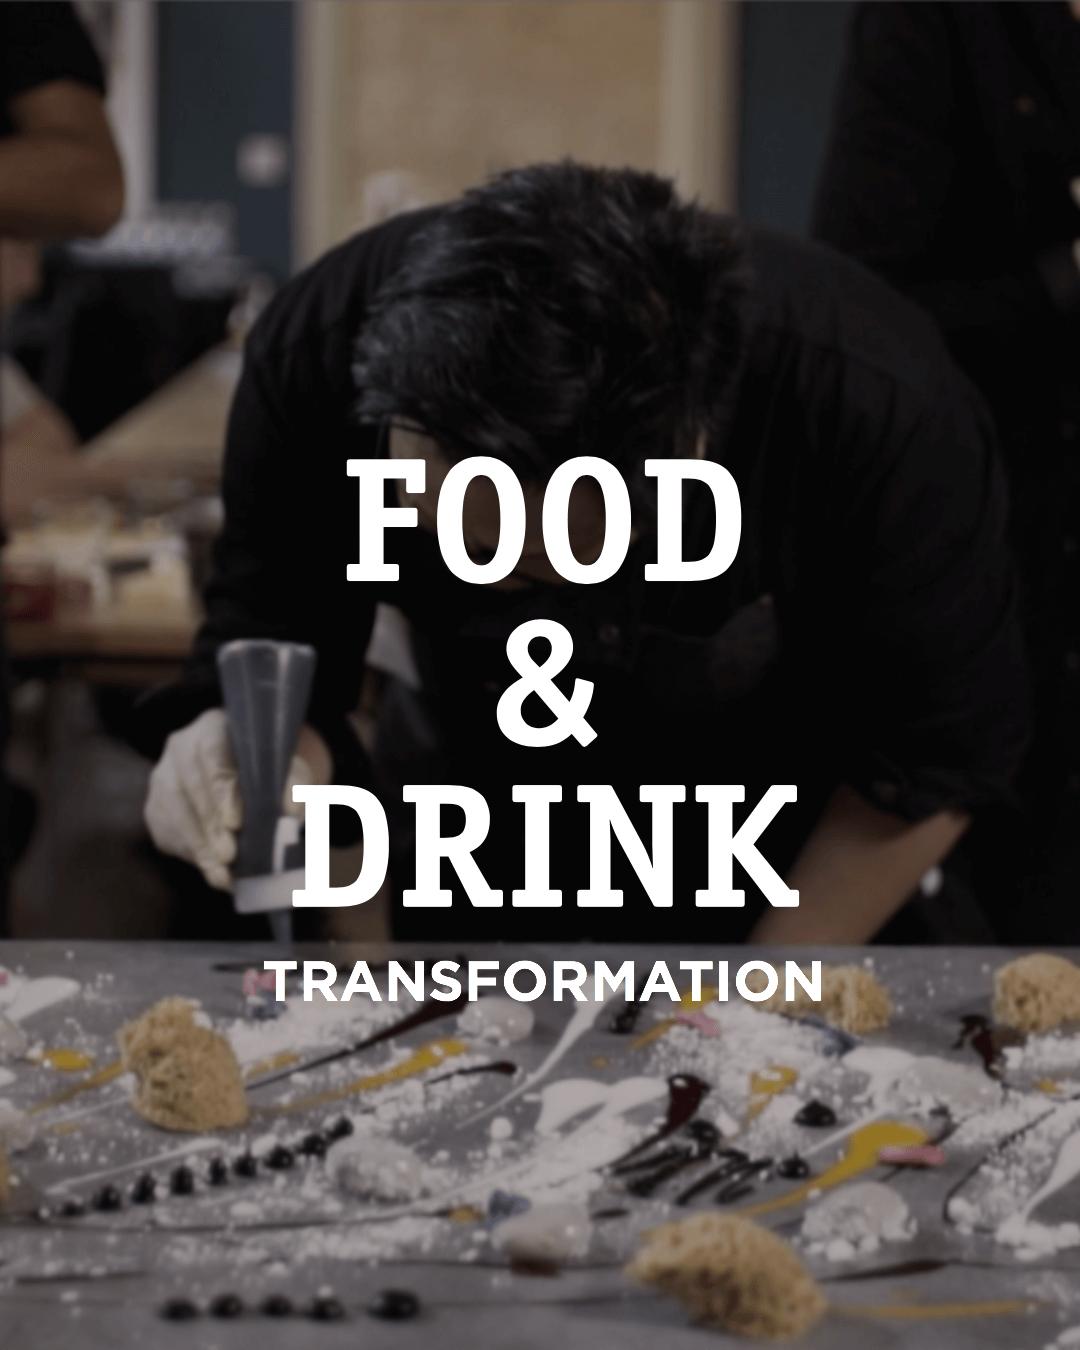 Thomas Henry Food & Drink Transformation